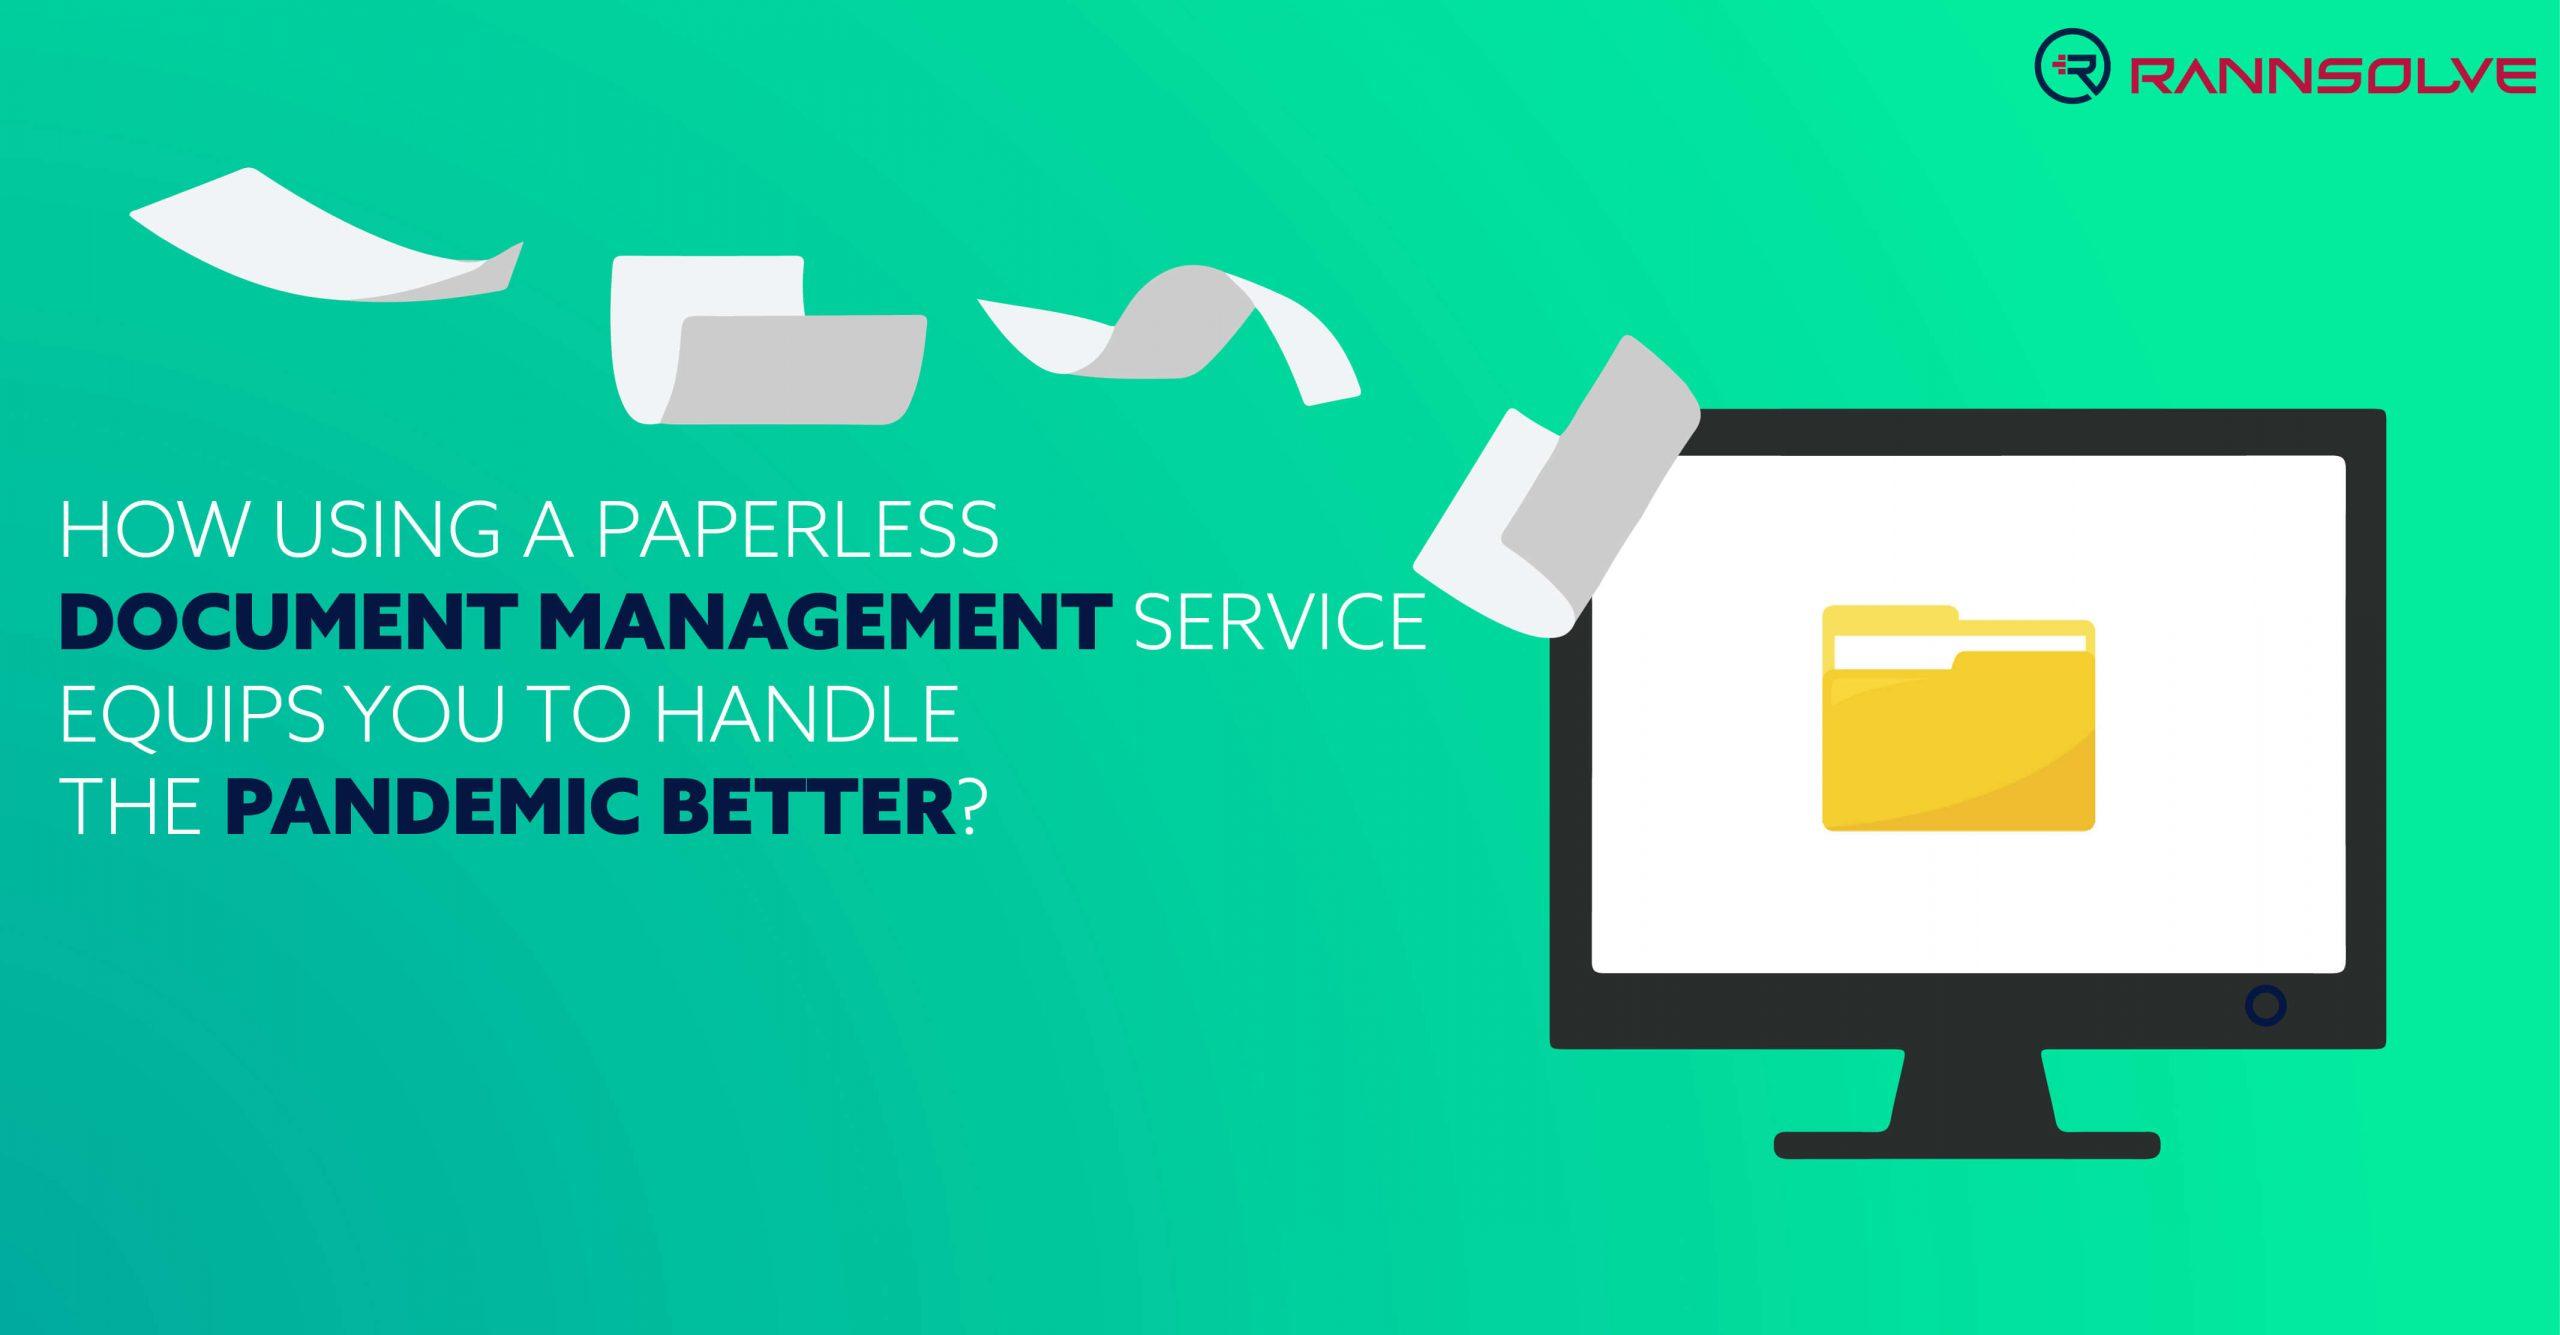 Paperless Document Management